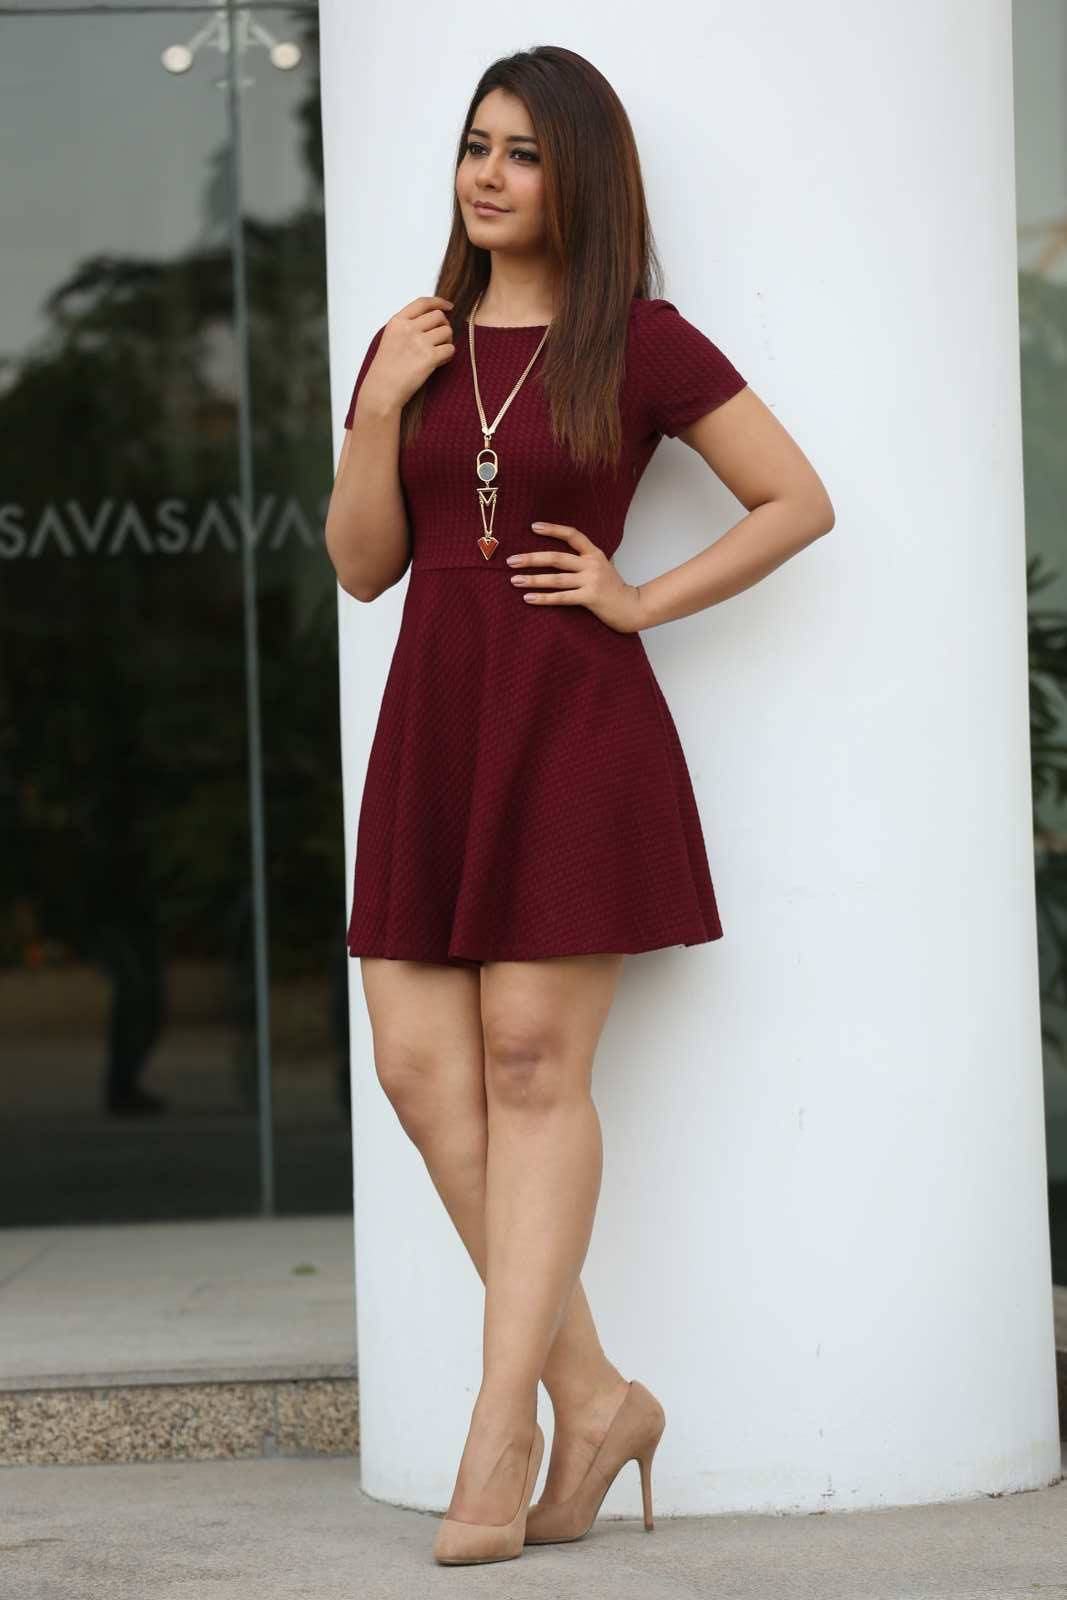 Rashi Khanna In Mini Skirt Photo-Shoot Pics 7 - Indian -8712